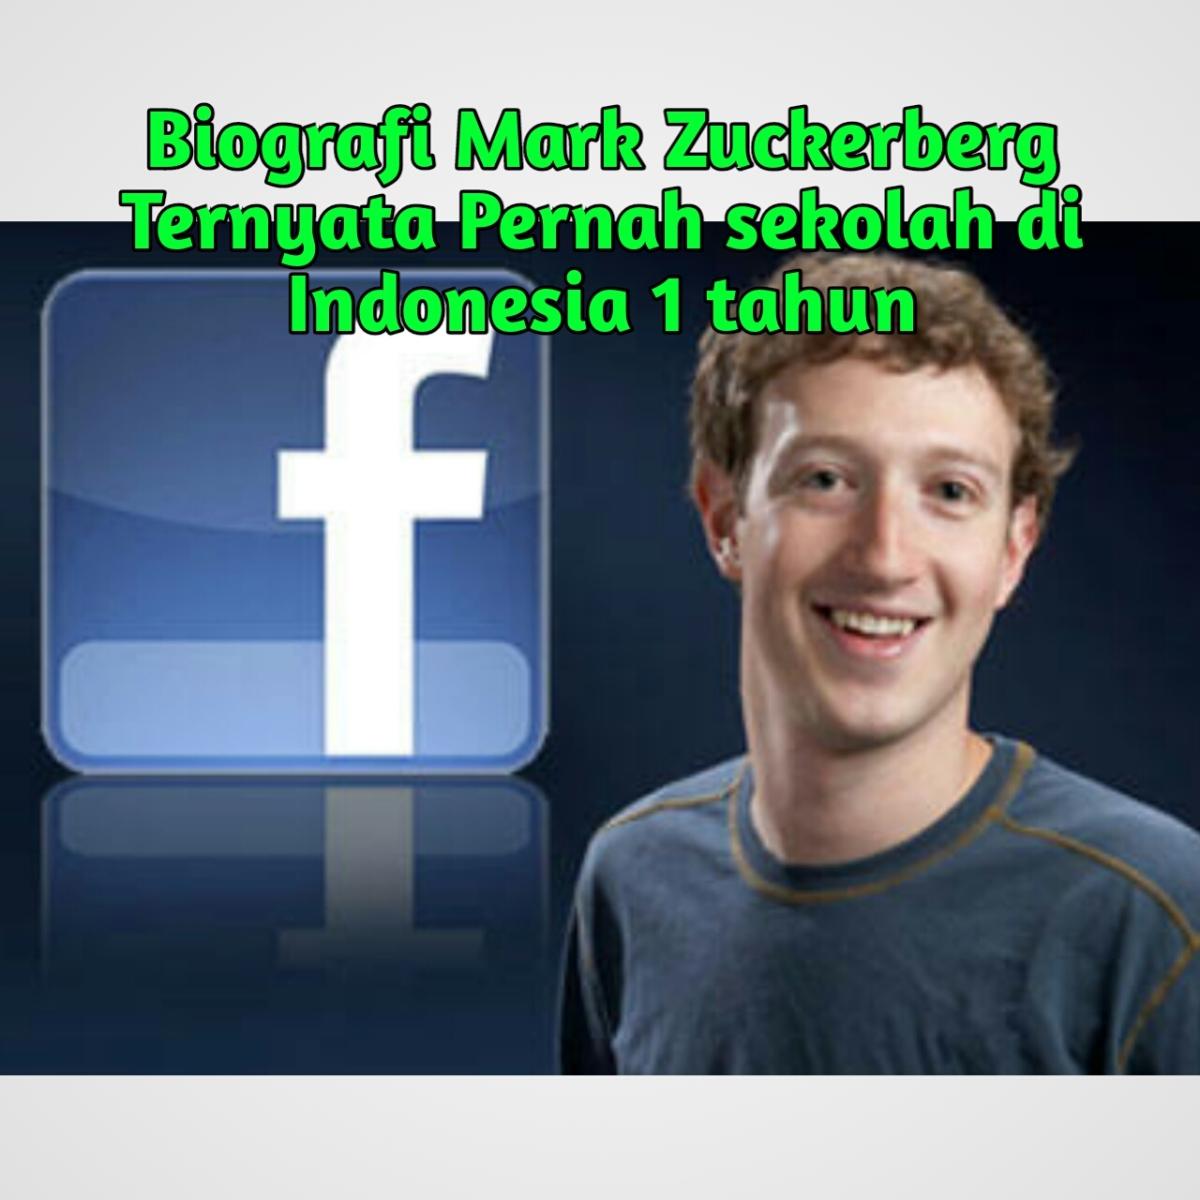 Biografi Singkat Mark Zuckerberg -Penemu Facebook -Pencipta Facebook -Pendiri Facebook -Pembuat Facebook